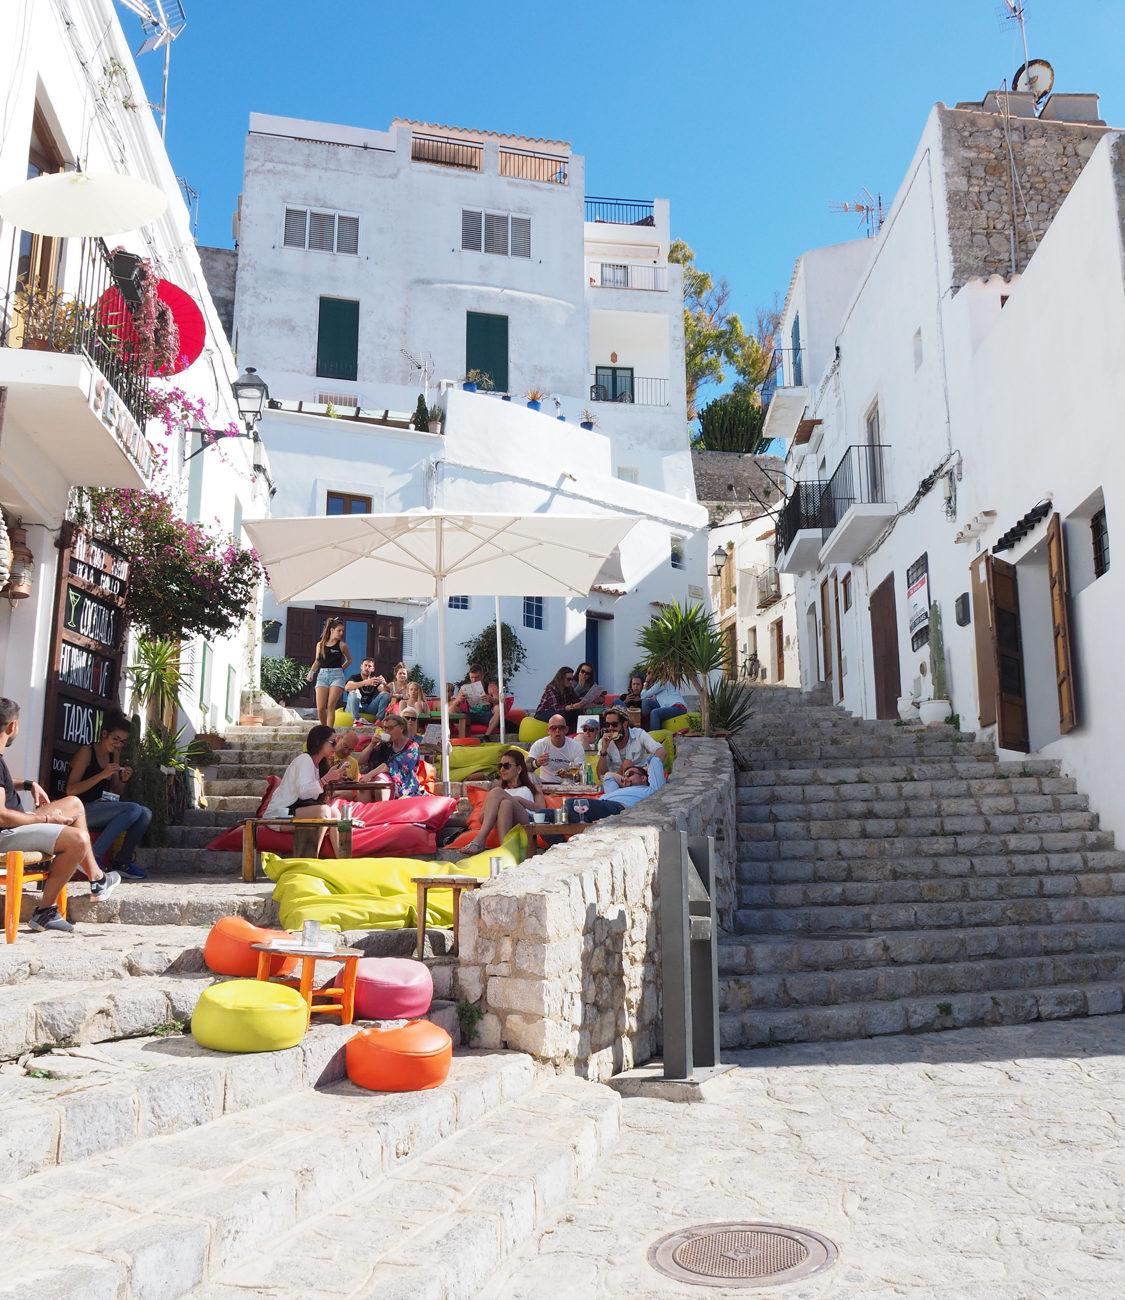 Het oude centrum van Ibiza stad met witte huizen, steegjes, terrasjes en trappetjes.